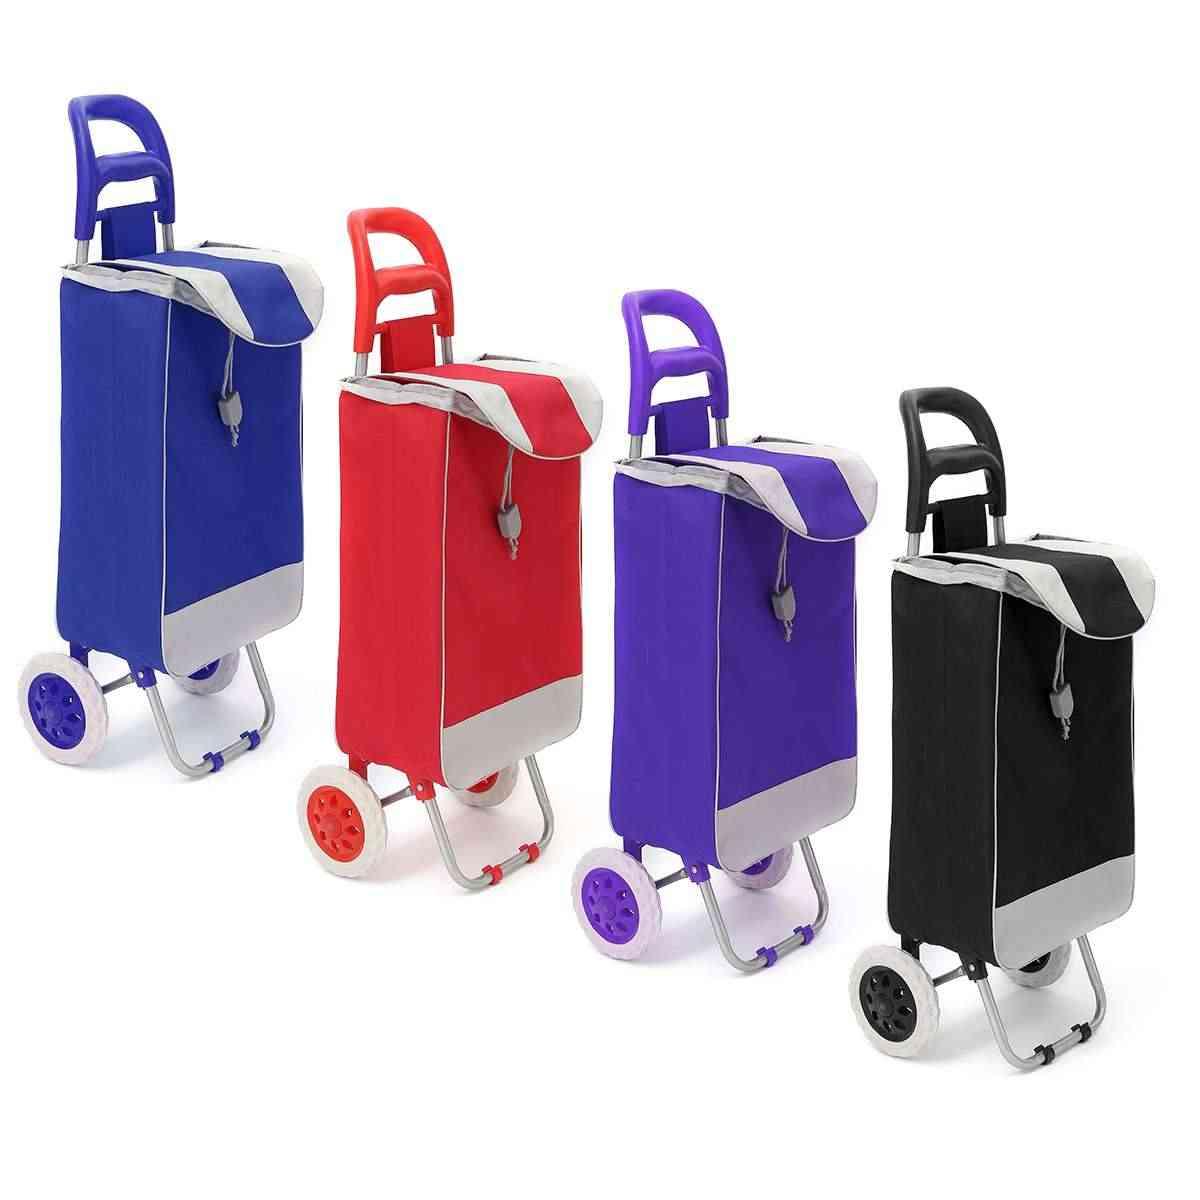 45l Foldable Shopping Trolley Bag -on Wheels